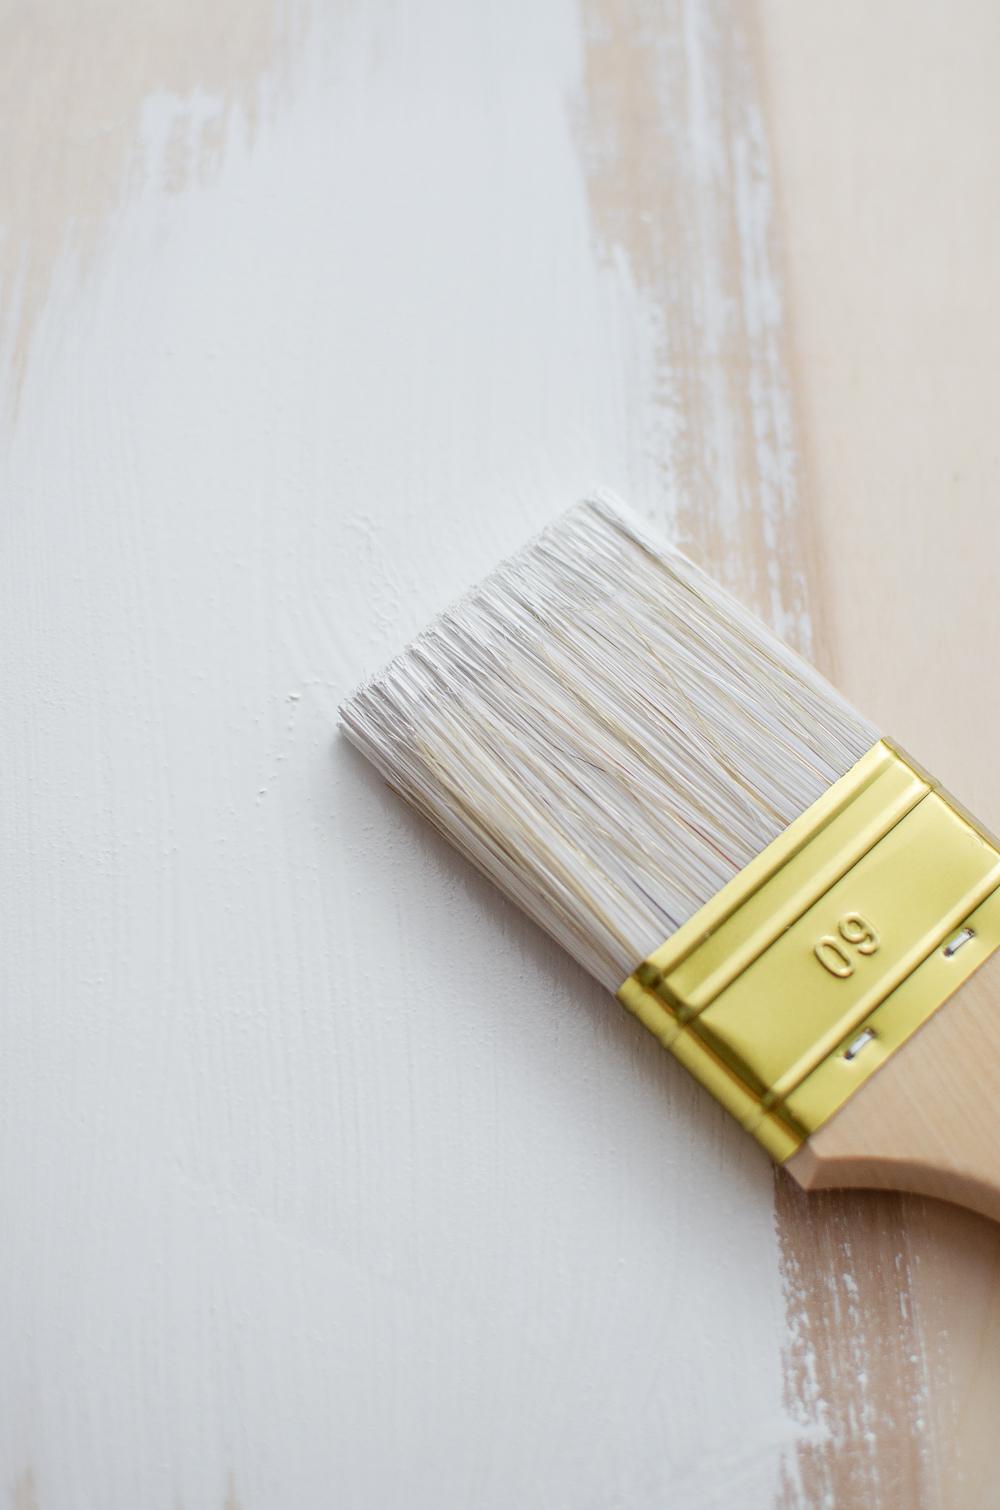 Pinnwand DIY-Fotoboard selbst machen-Smartphoto Fotos bestellen-Fotos online bestellen-DIY Blogger-andysparkles